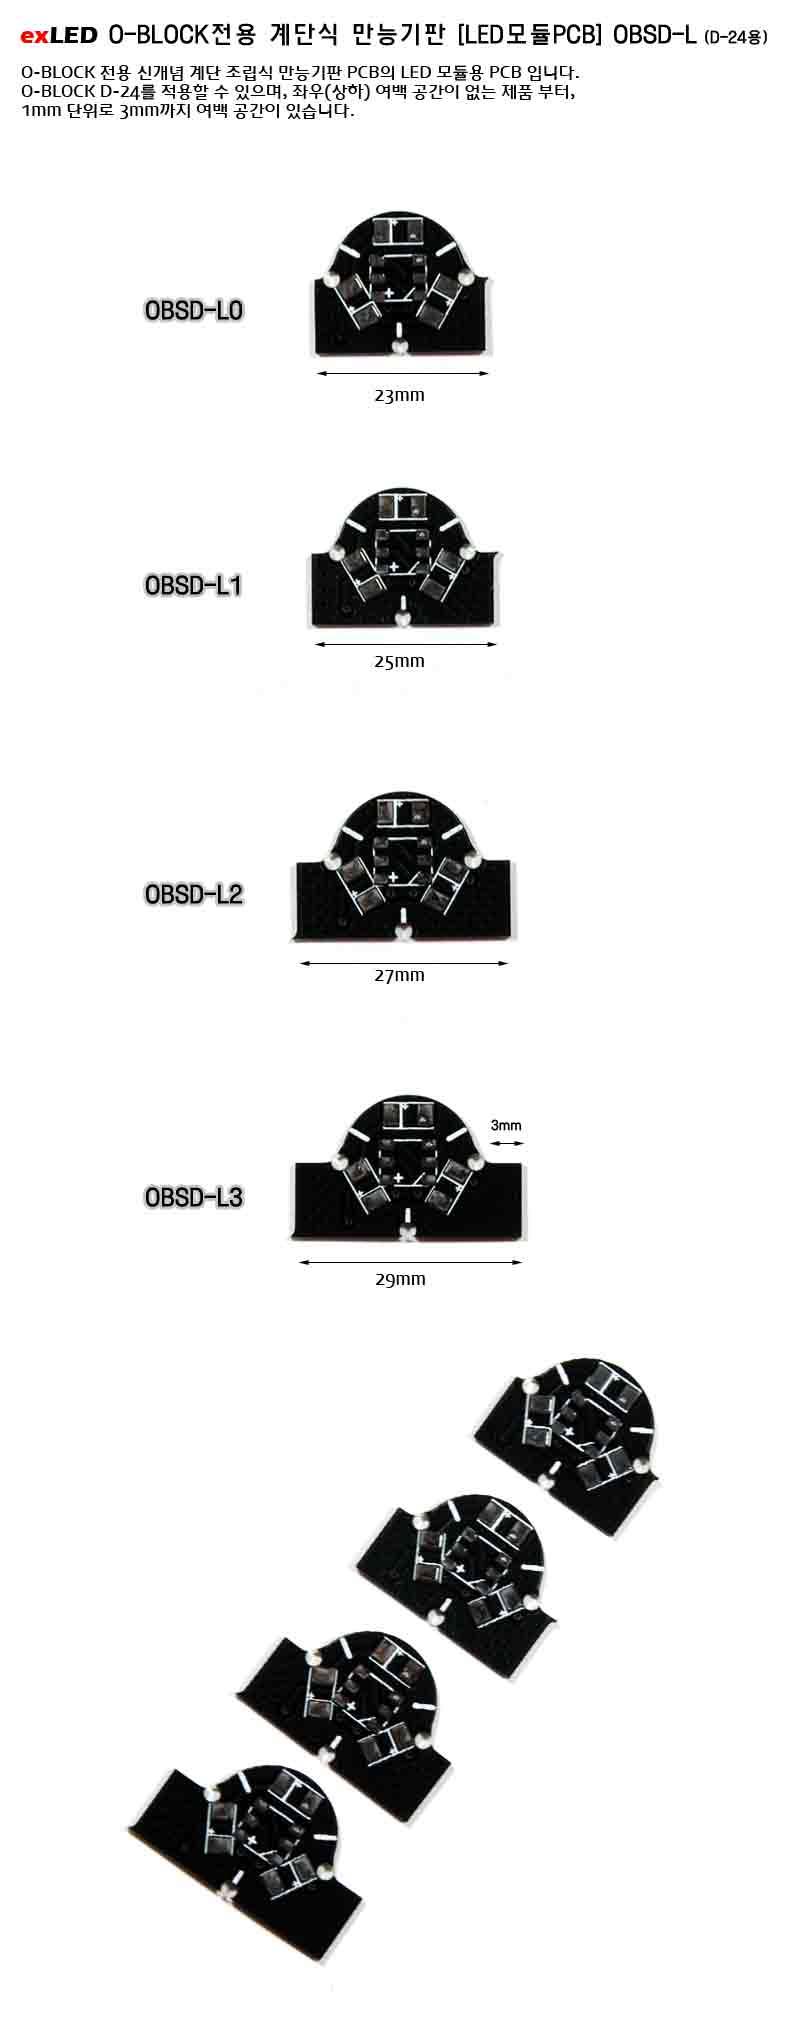 Плата O-BLOCK OBSD-L0 D-24